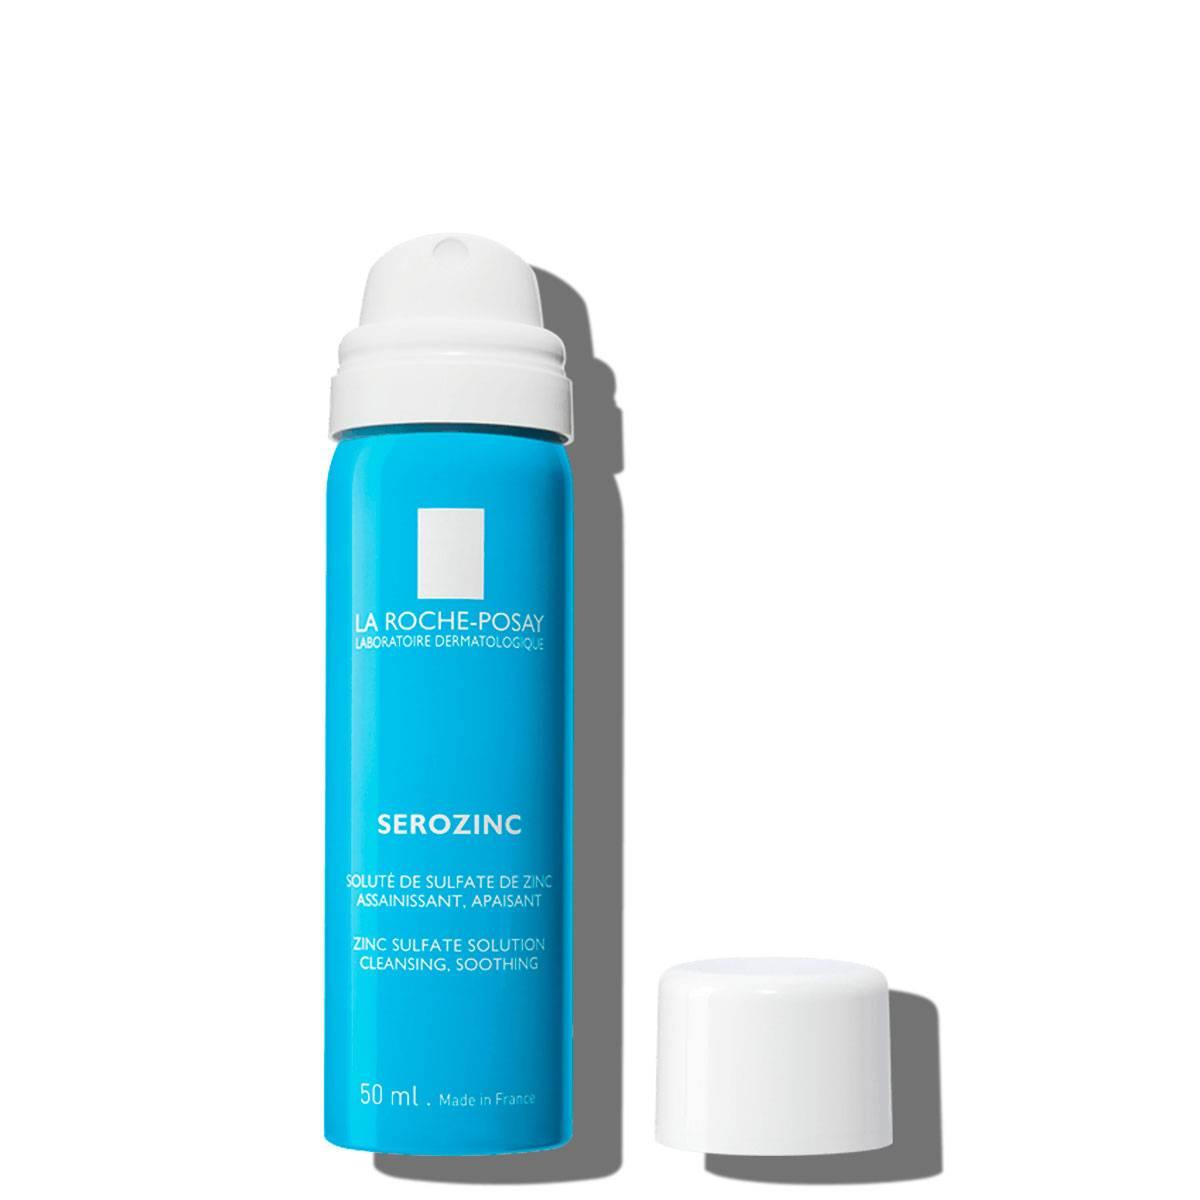 La Roche Posay ProductPage Serozinc Spray Zinc 50ml 3337875522601 Open